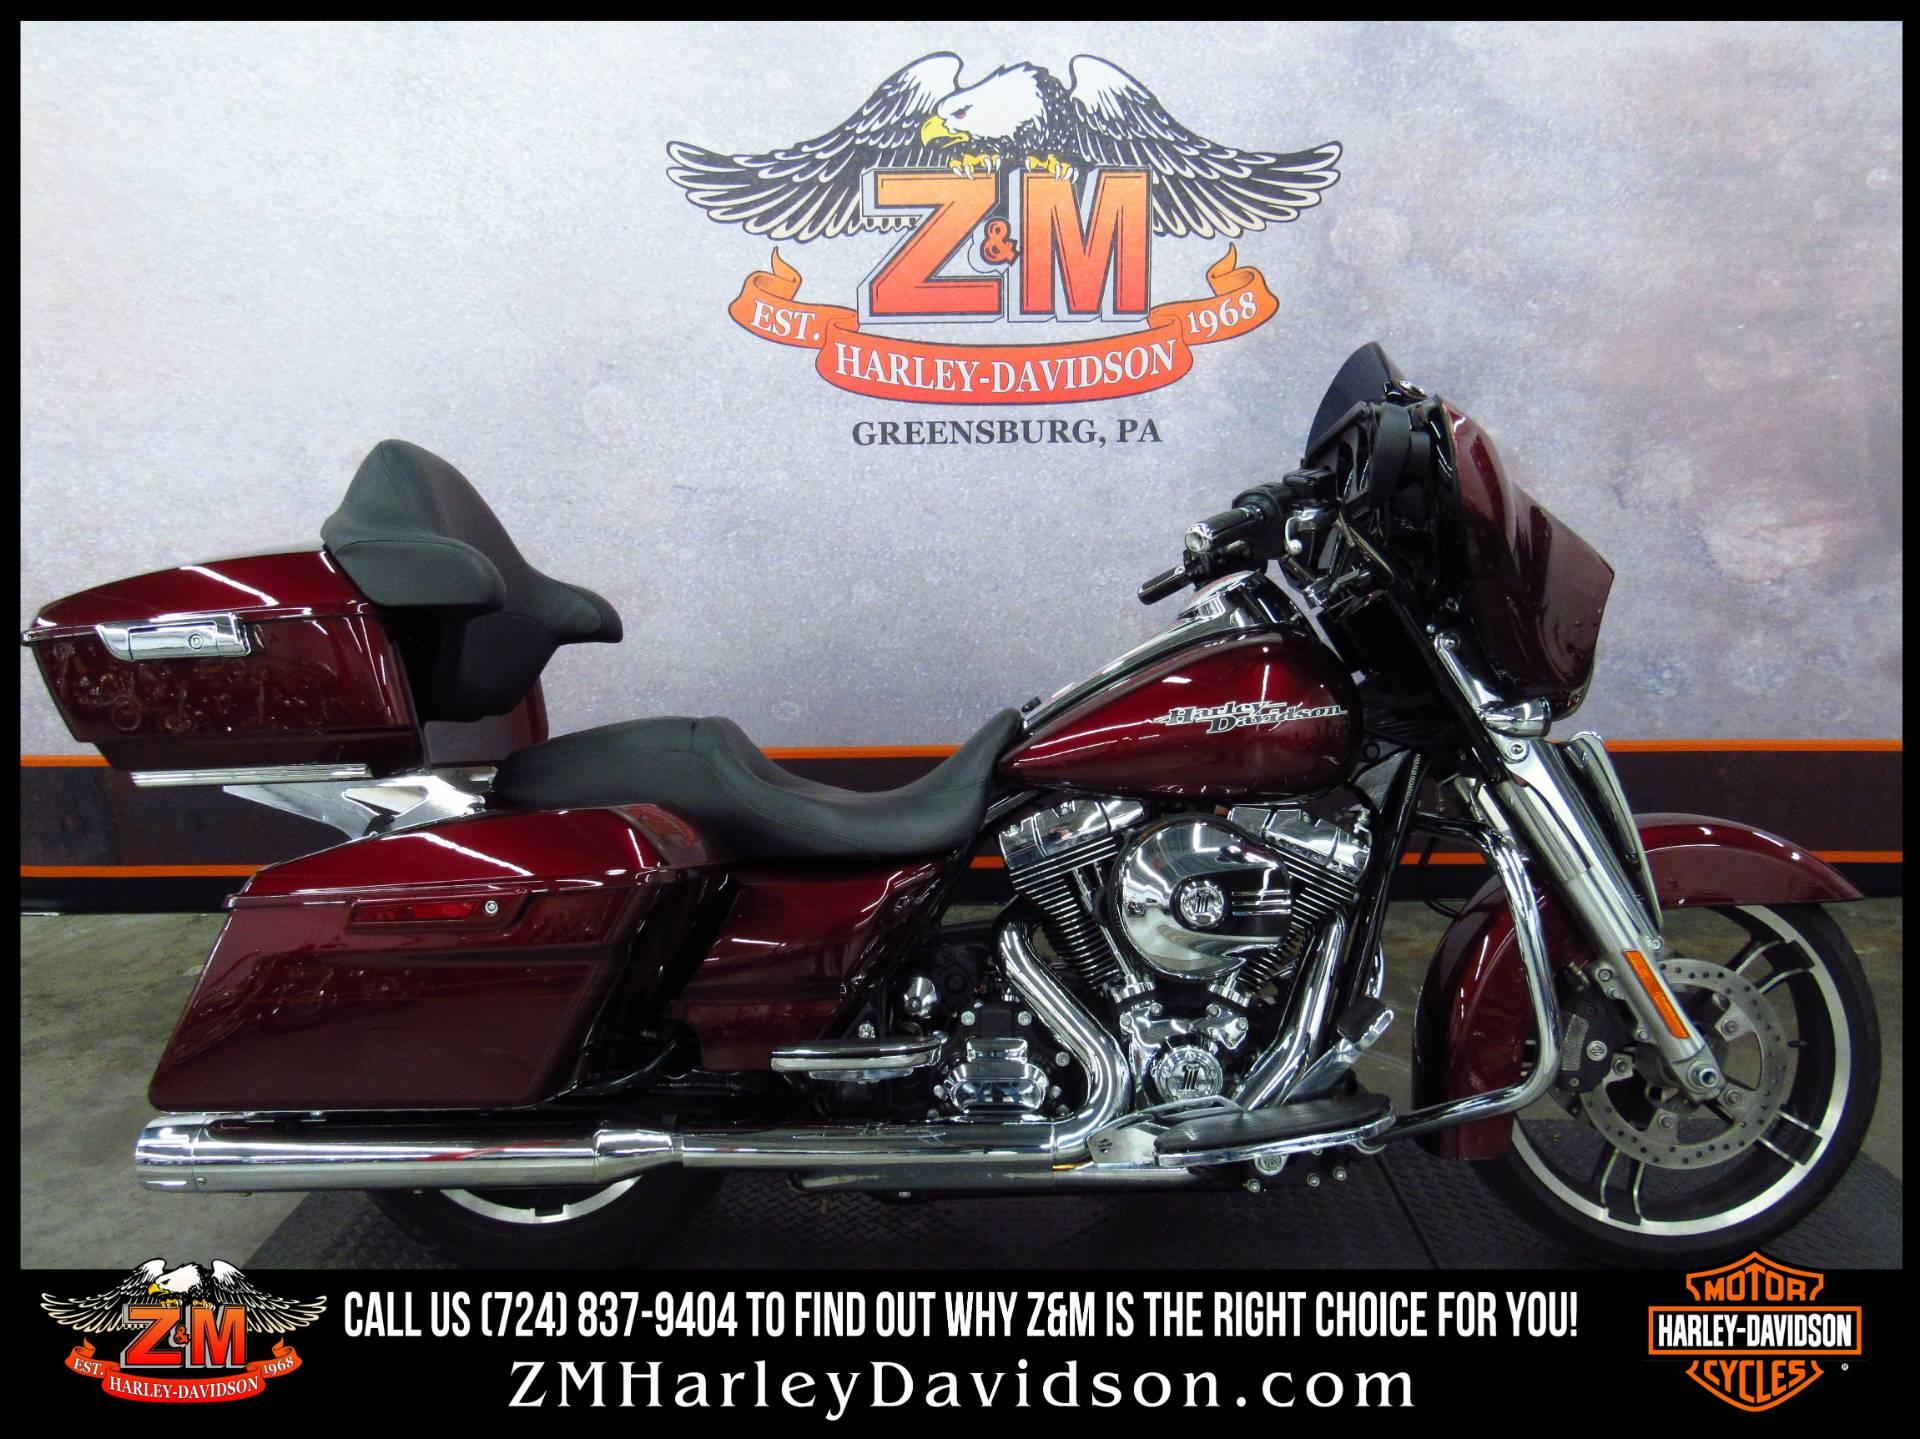 2014 Harley-Davidson Street Glide Special 1